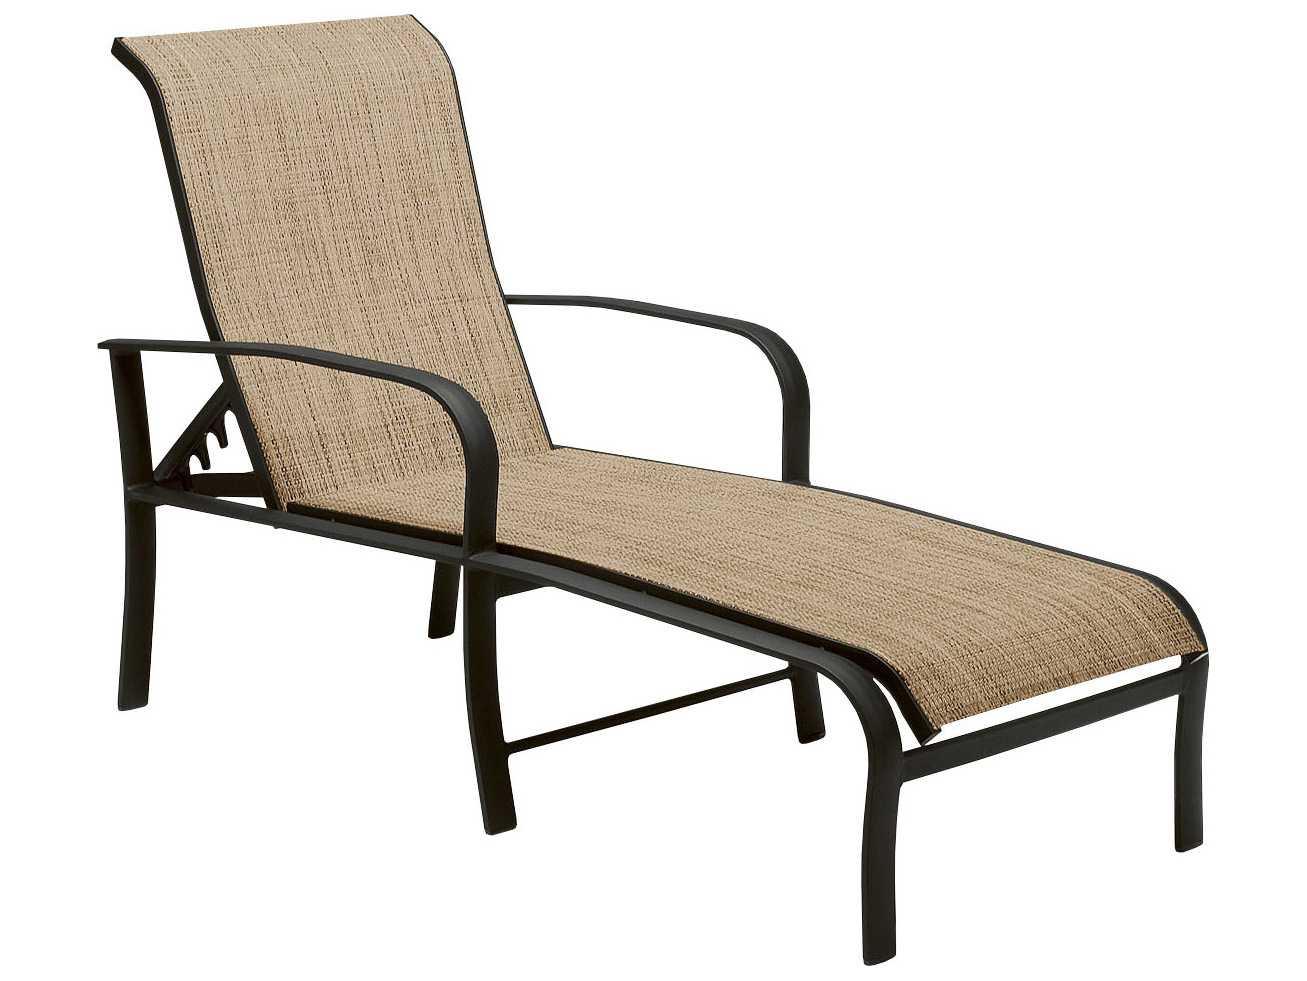 Woodard Fremont Sling Aluminum Adjustable Chaise Lounge